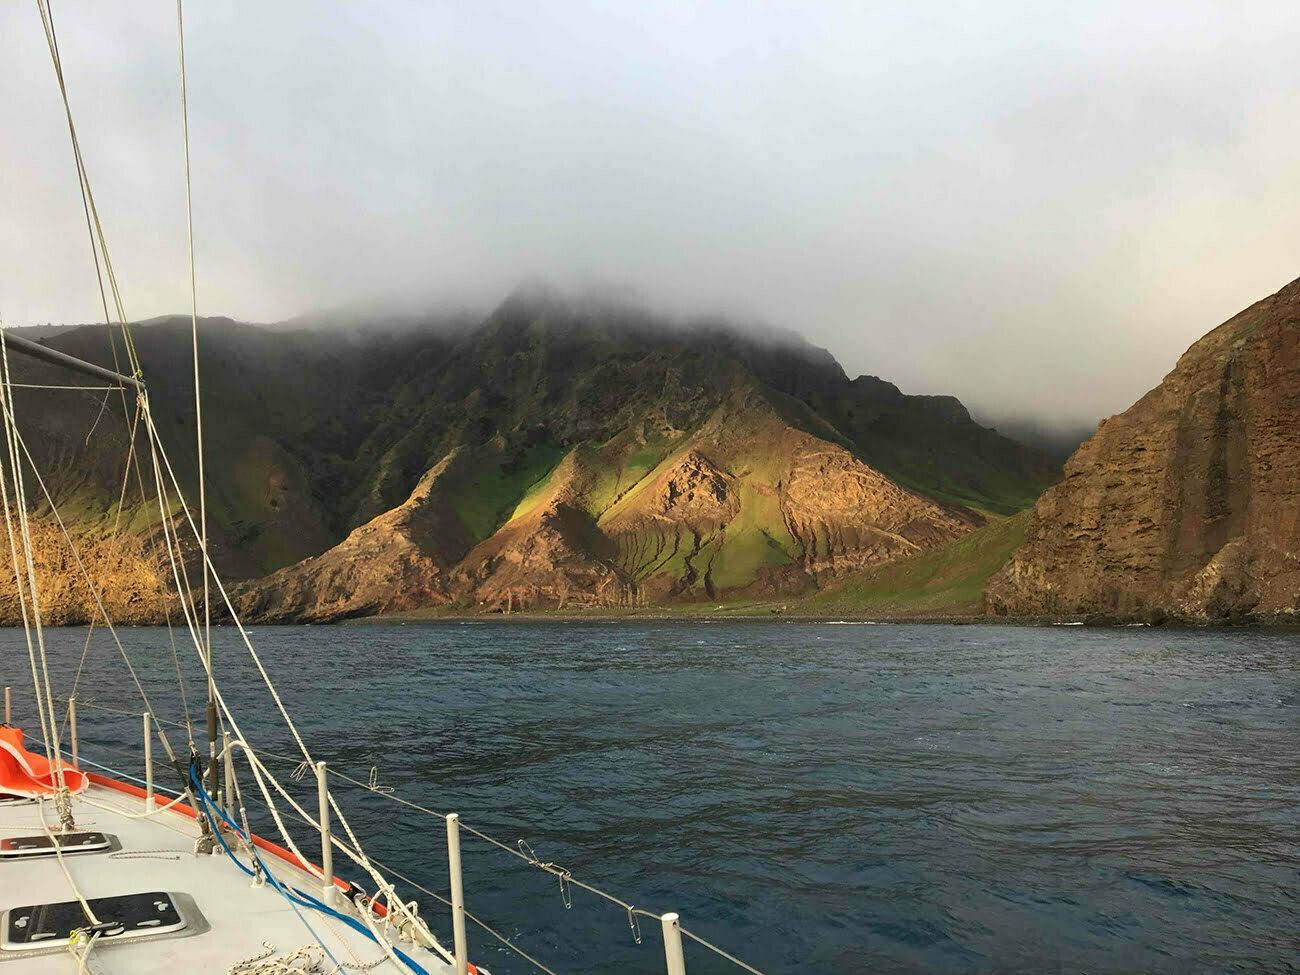 imagem da ilha Robinson crusoé.